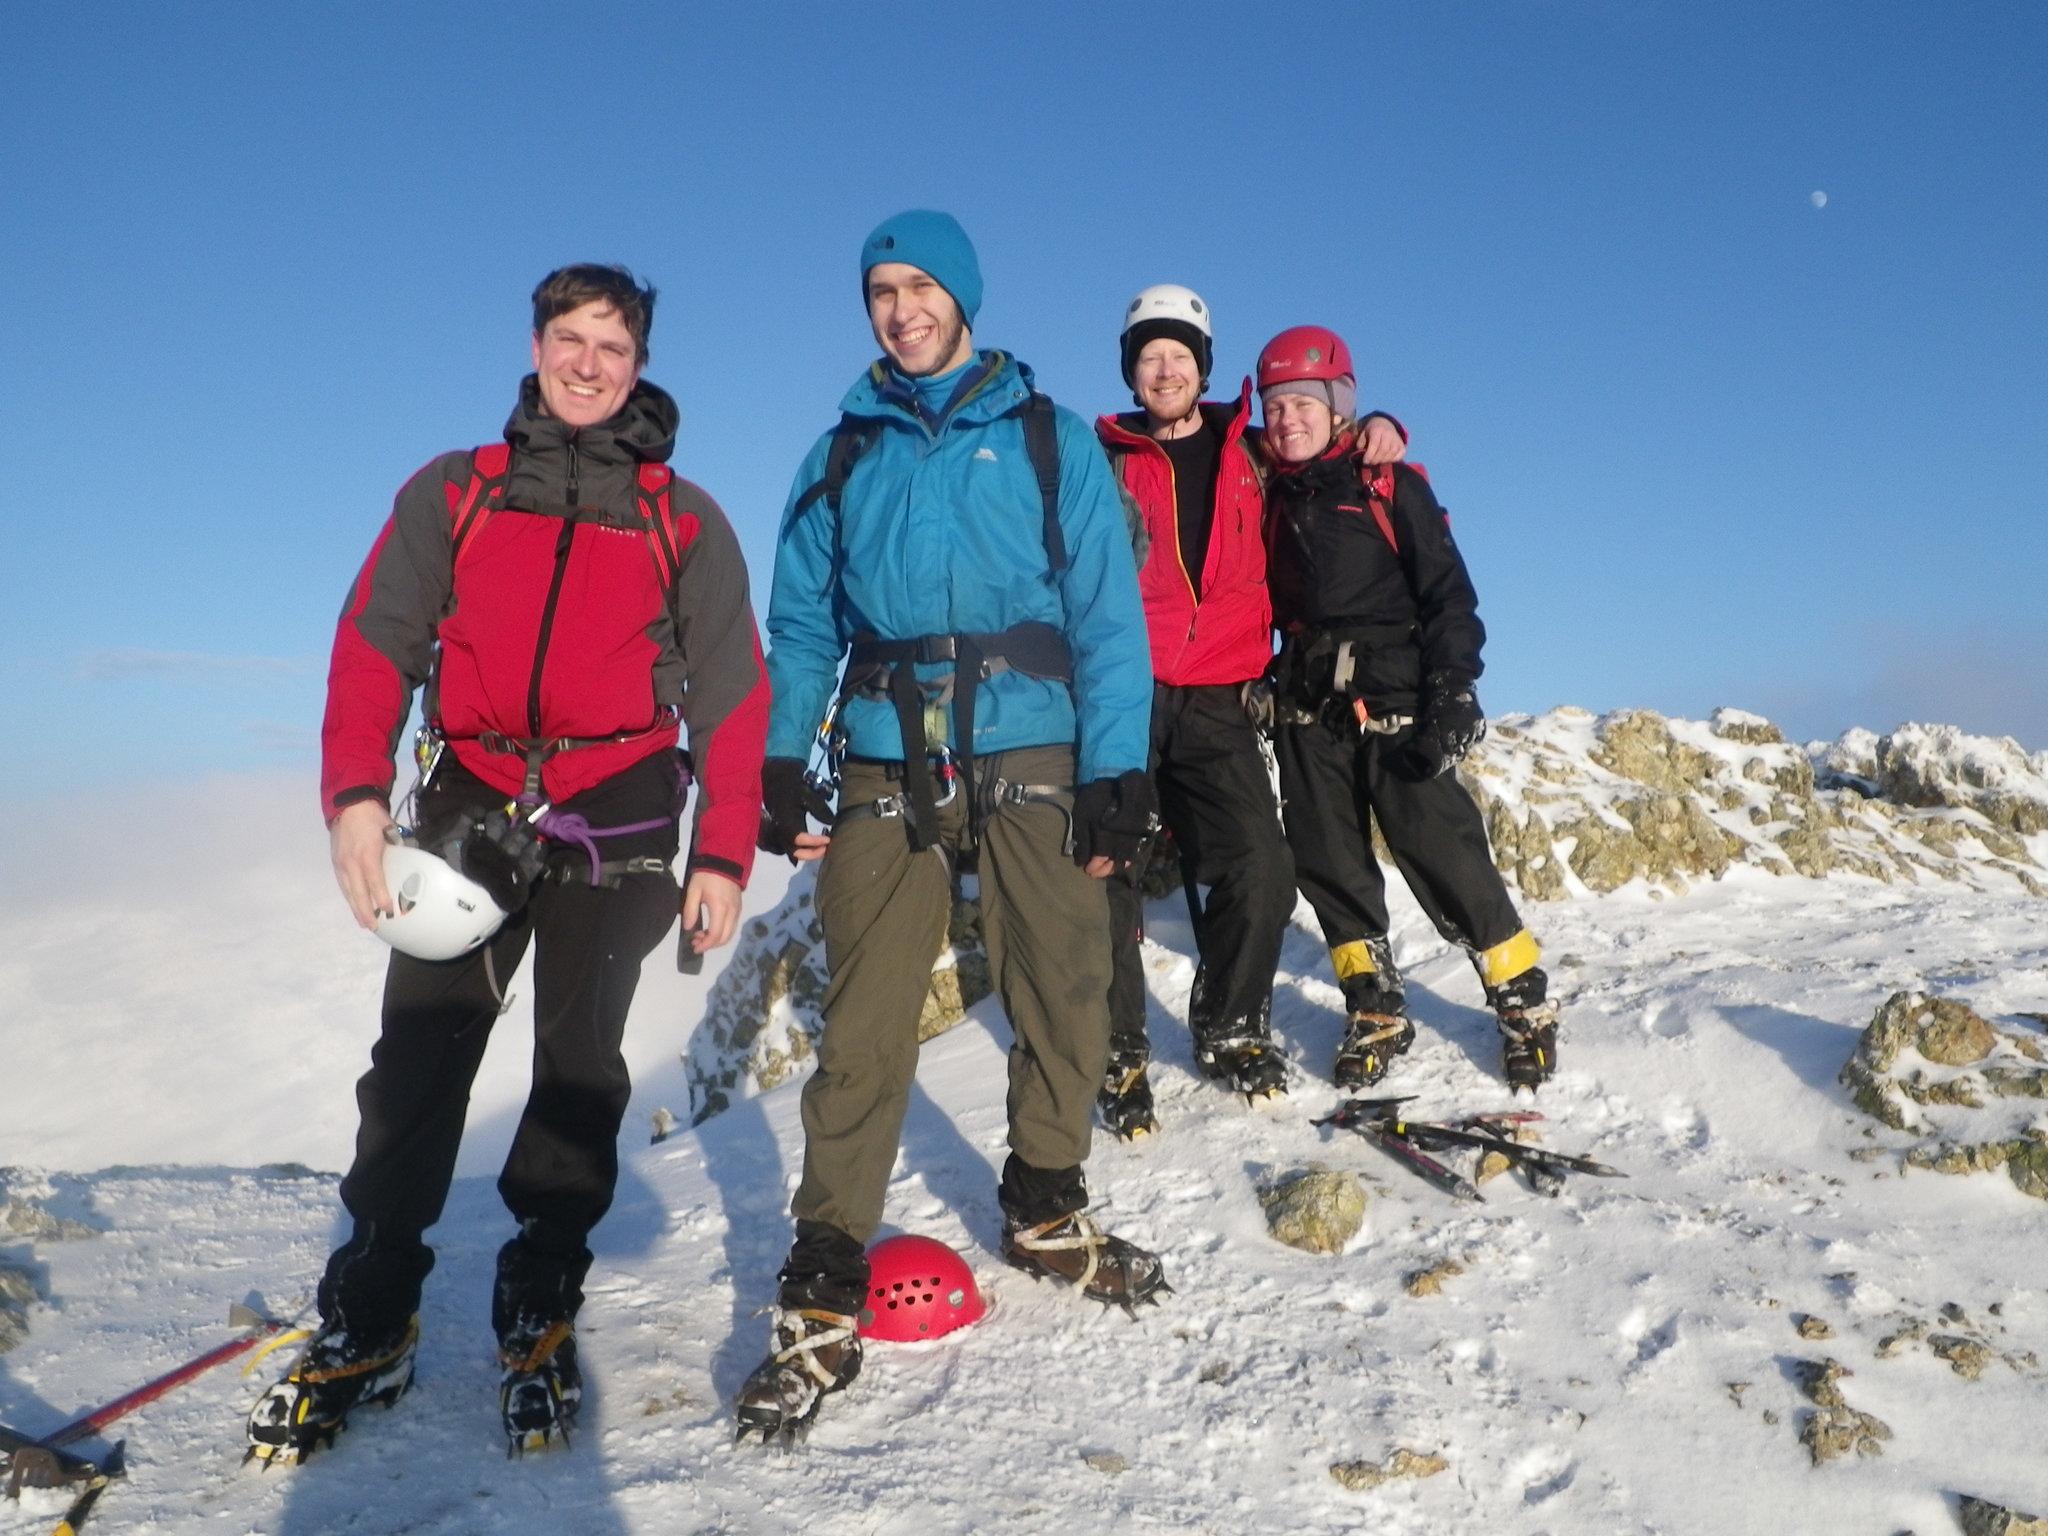 LW 13.01 Lake District winter mountaineering 12 rs.jpg